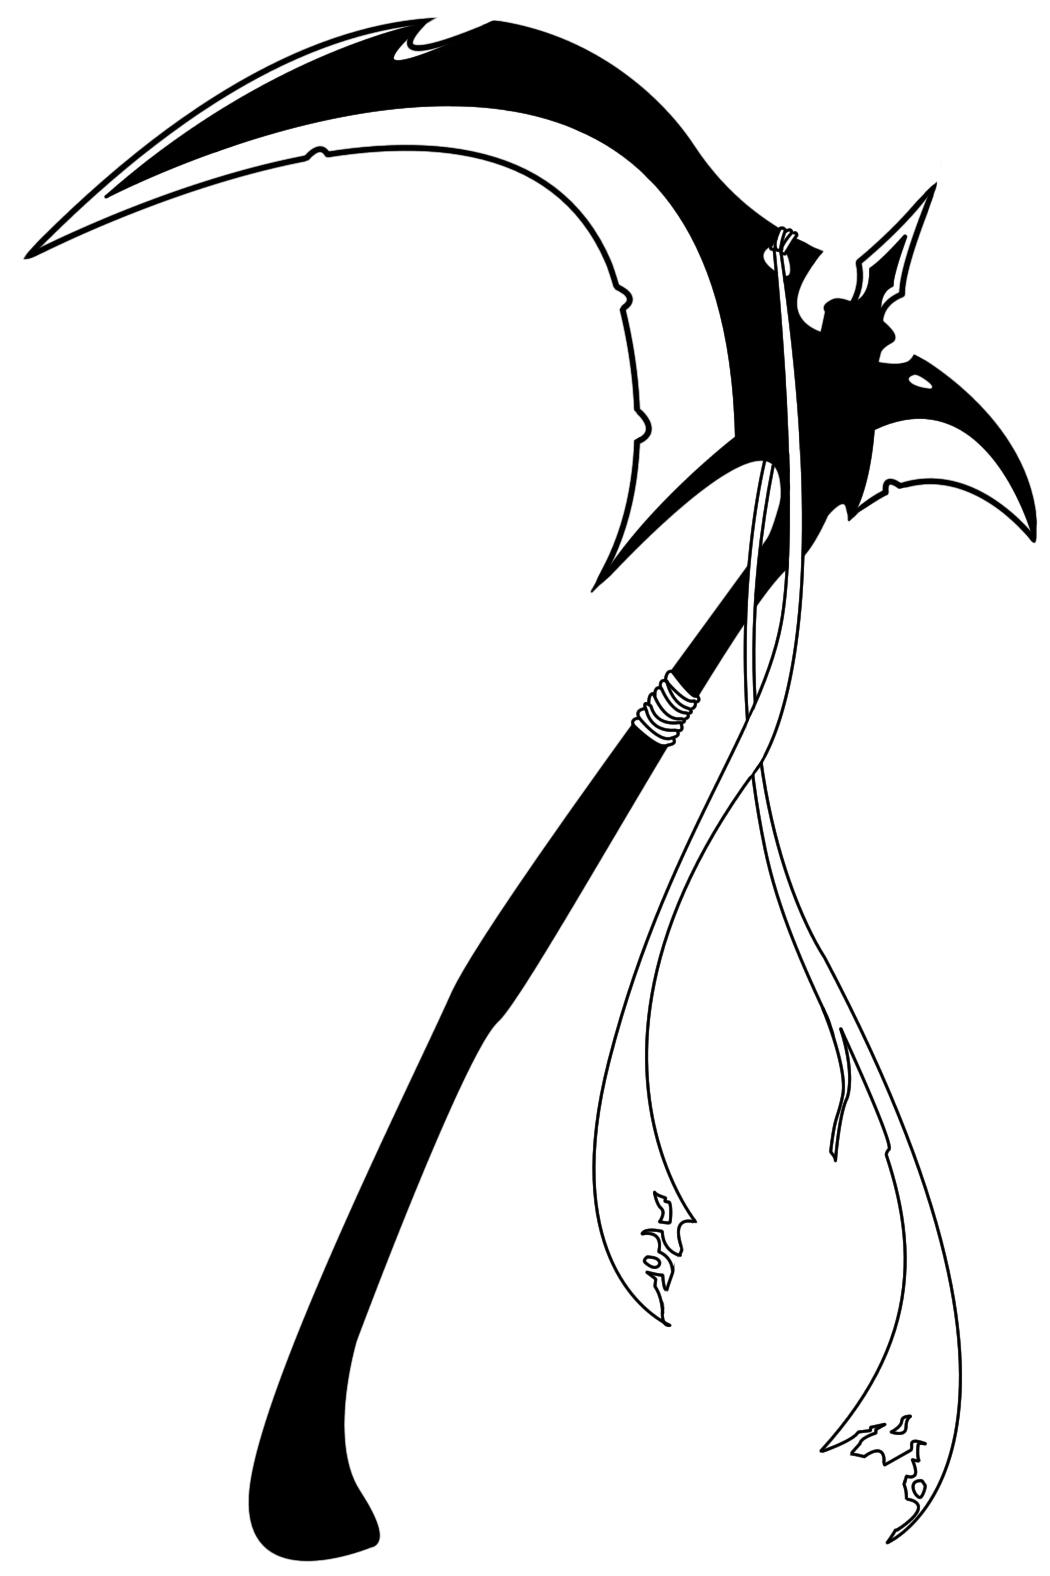 Drawn scythe tribal By by Balsavor Balsavor tattoo